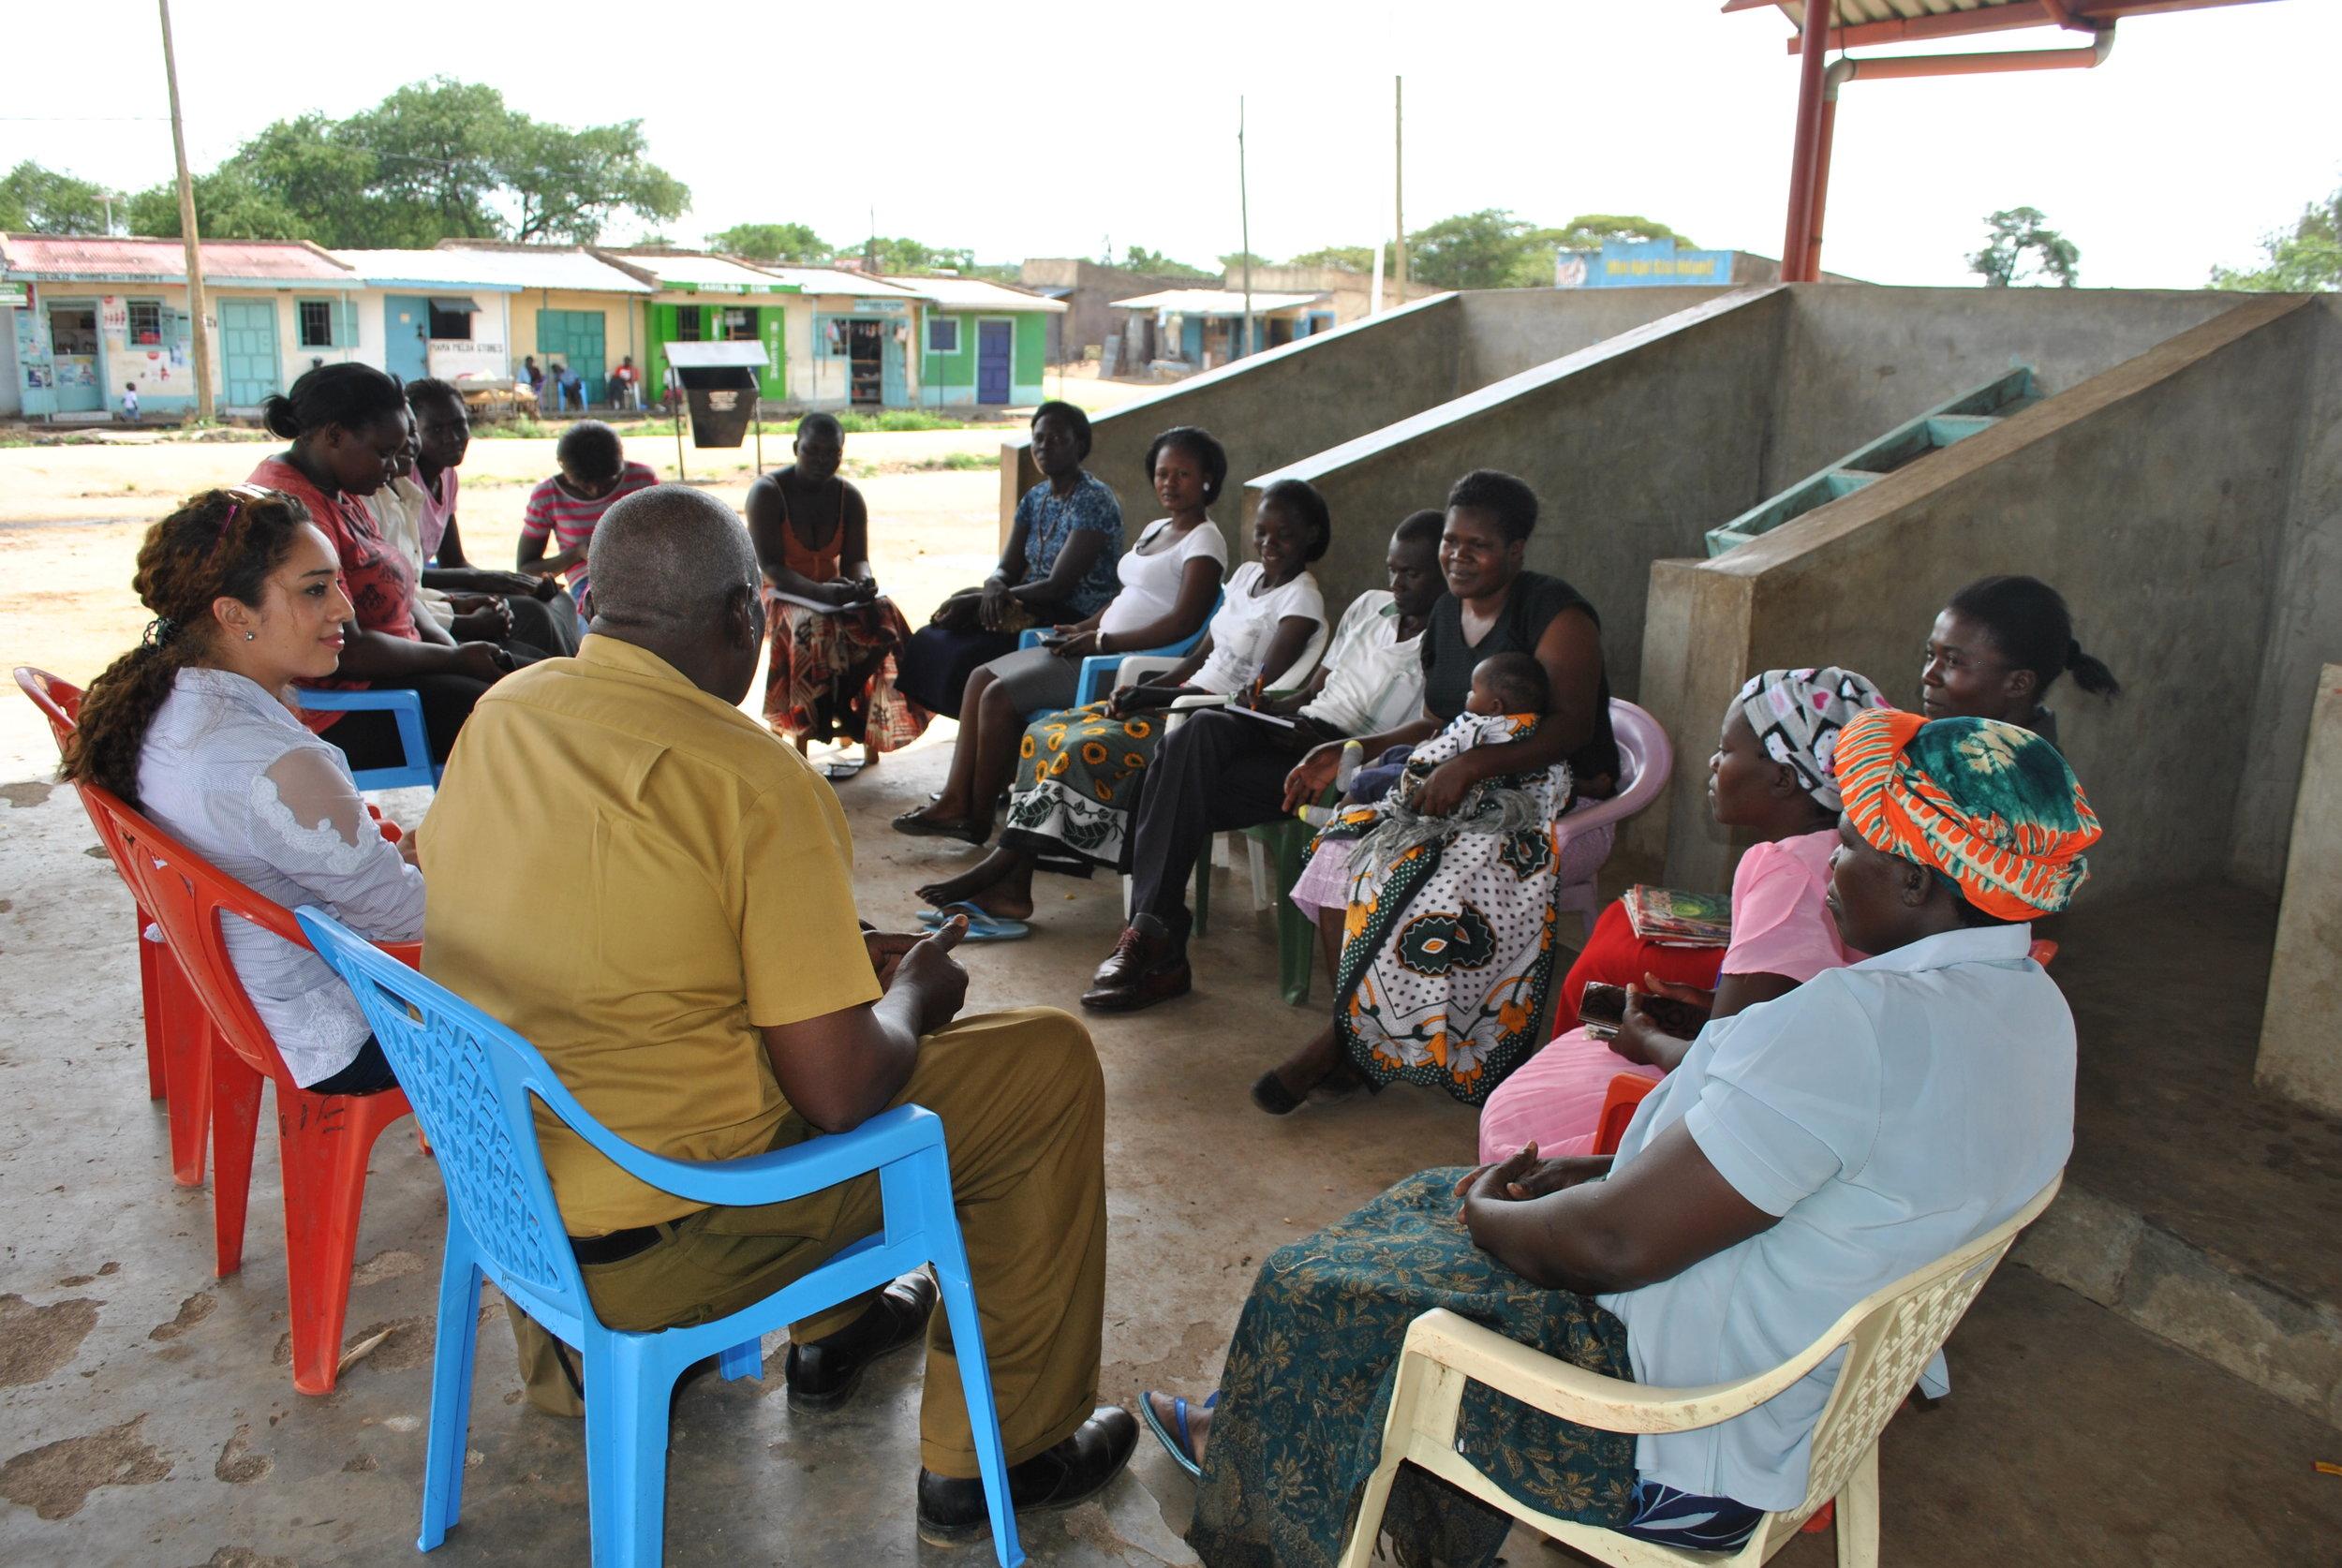 Cherehani Africa tailors group meeting in Aram market in Rarienda Constituency